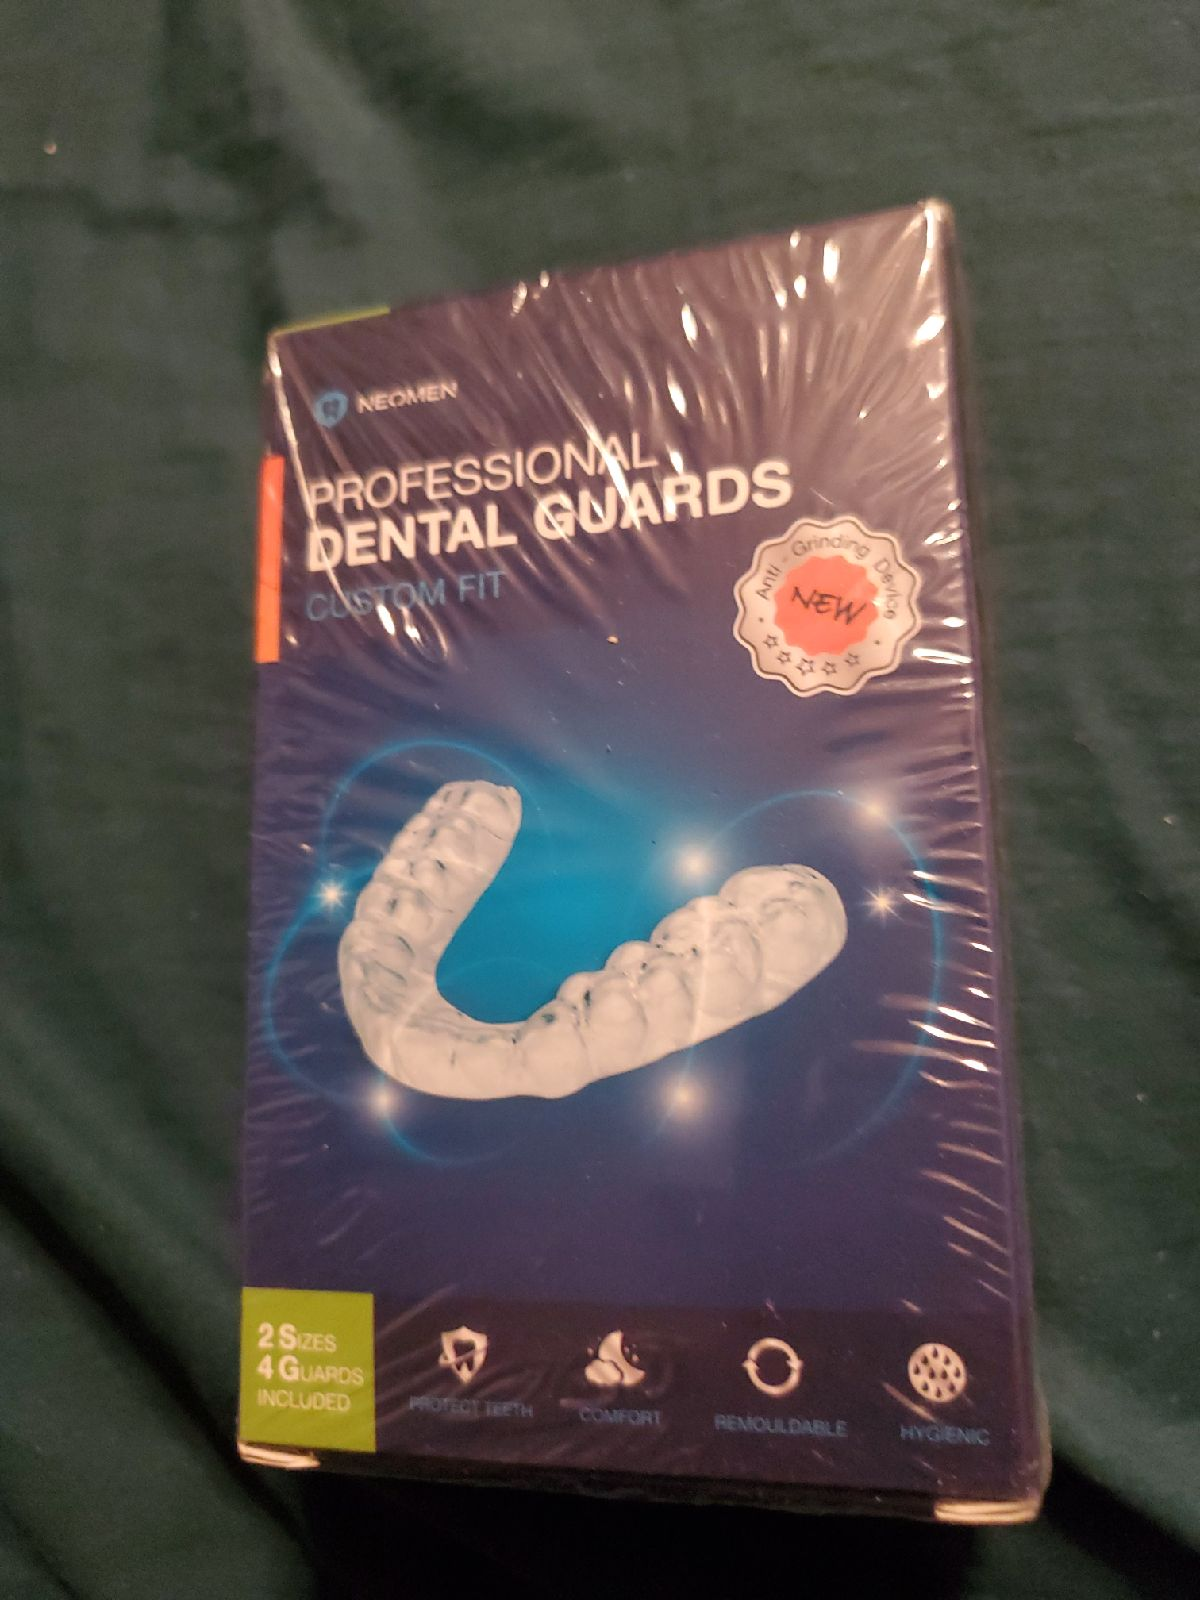 Neomen professional dental guards